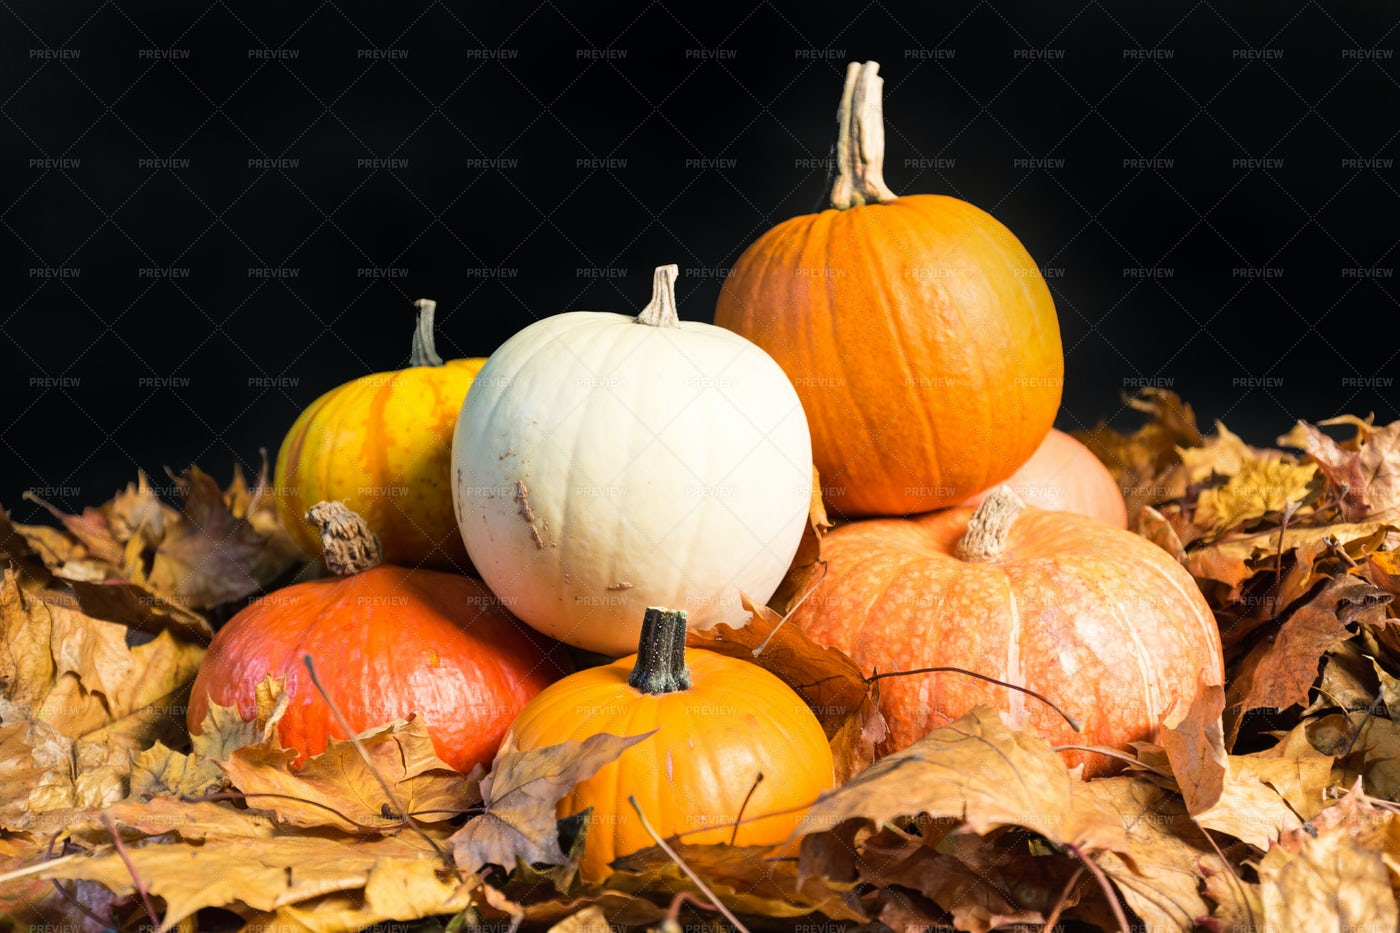 Cucurbit Gourds On Oak Leaves: Stock Photos